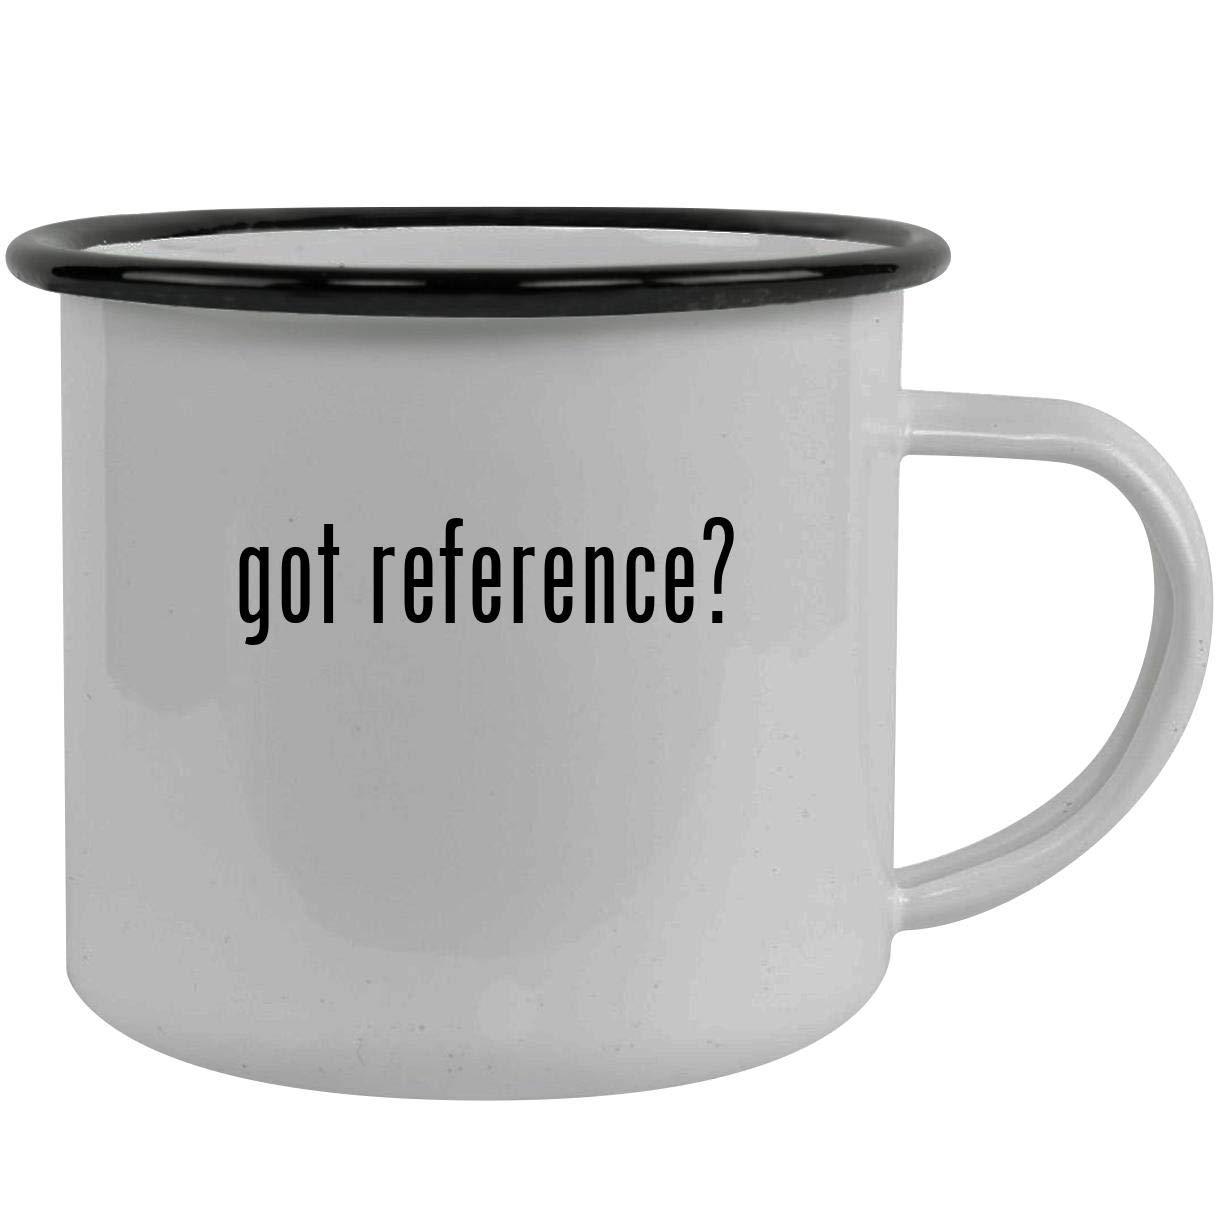 got reference? - Stainless Steel 12oz Camping Mug, Black